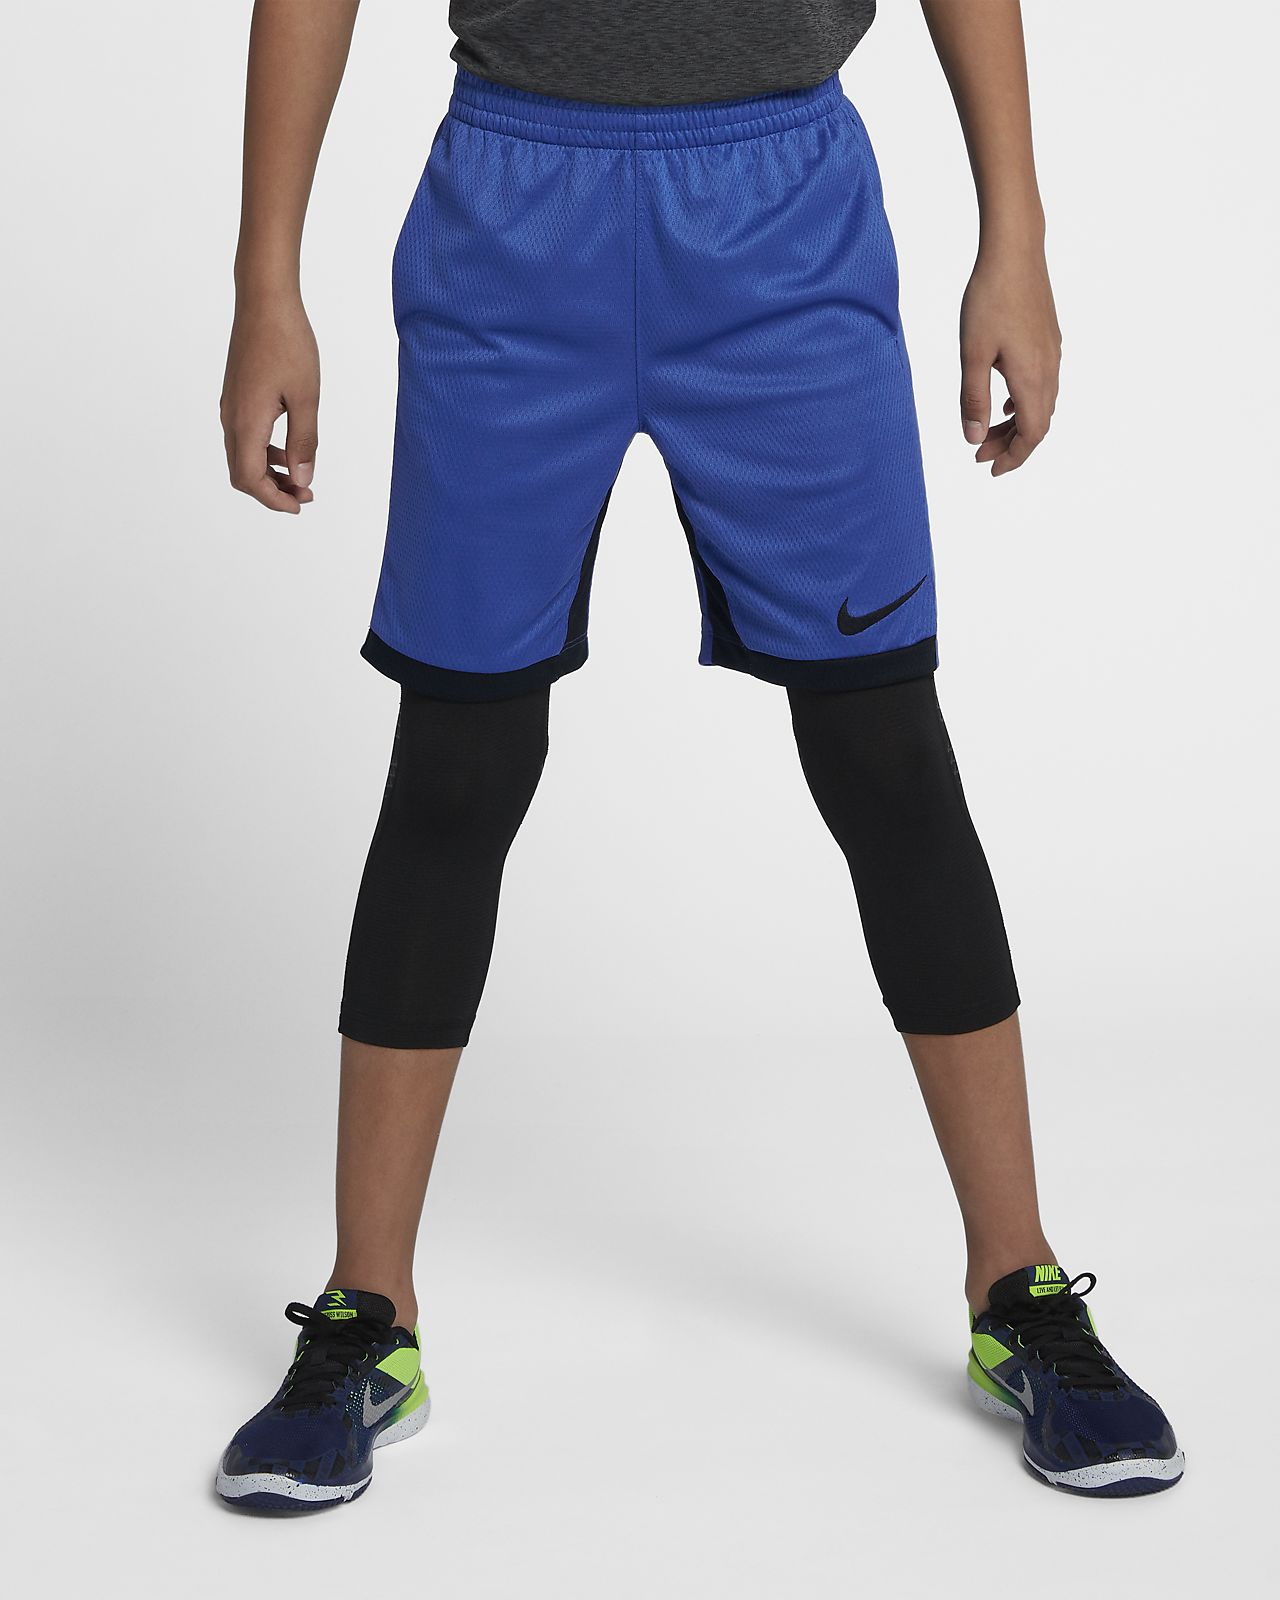 Nike Dri FIT Trophy Big Kids' (Boys') Training Shorts